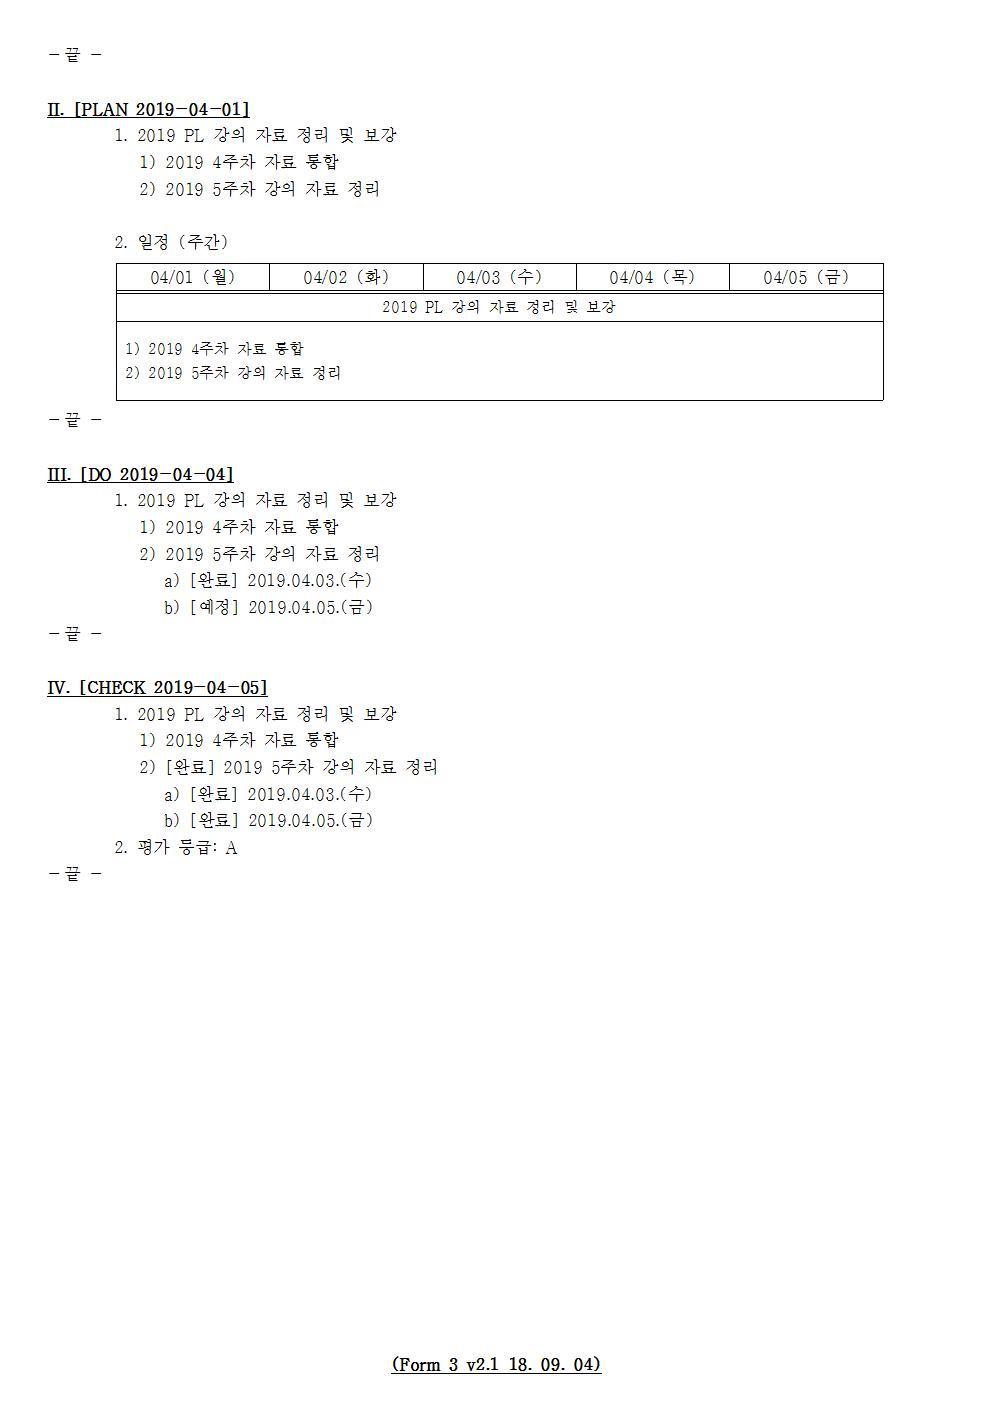 D-[19-014-PP-06]-[Book-PL]-[2019-04-05][JS]002.jpg